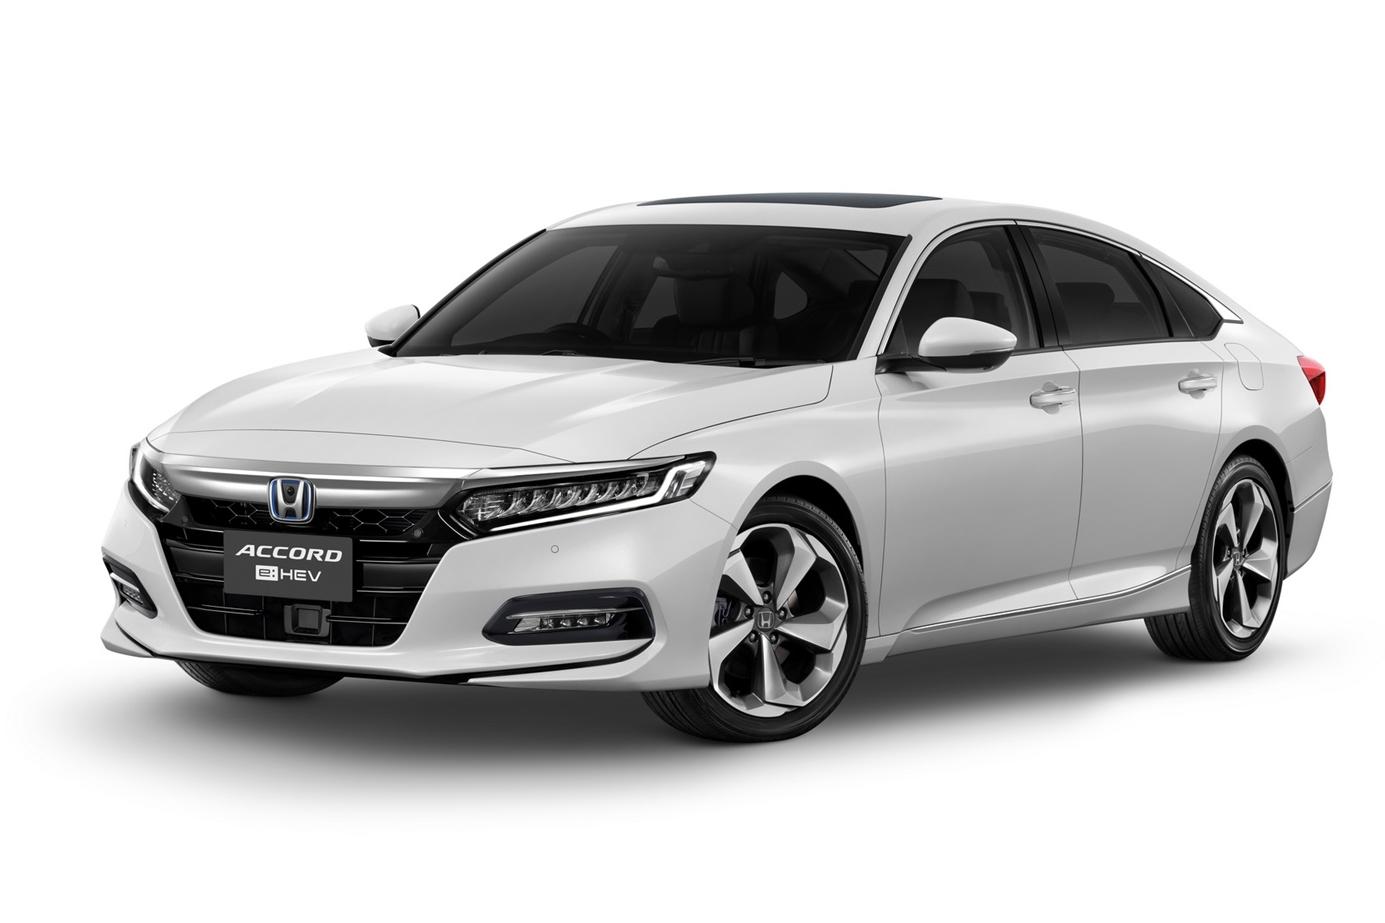 Honda Accord el ehev 2021 2022 AutoinfoOnline (6)